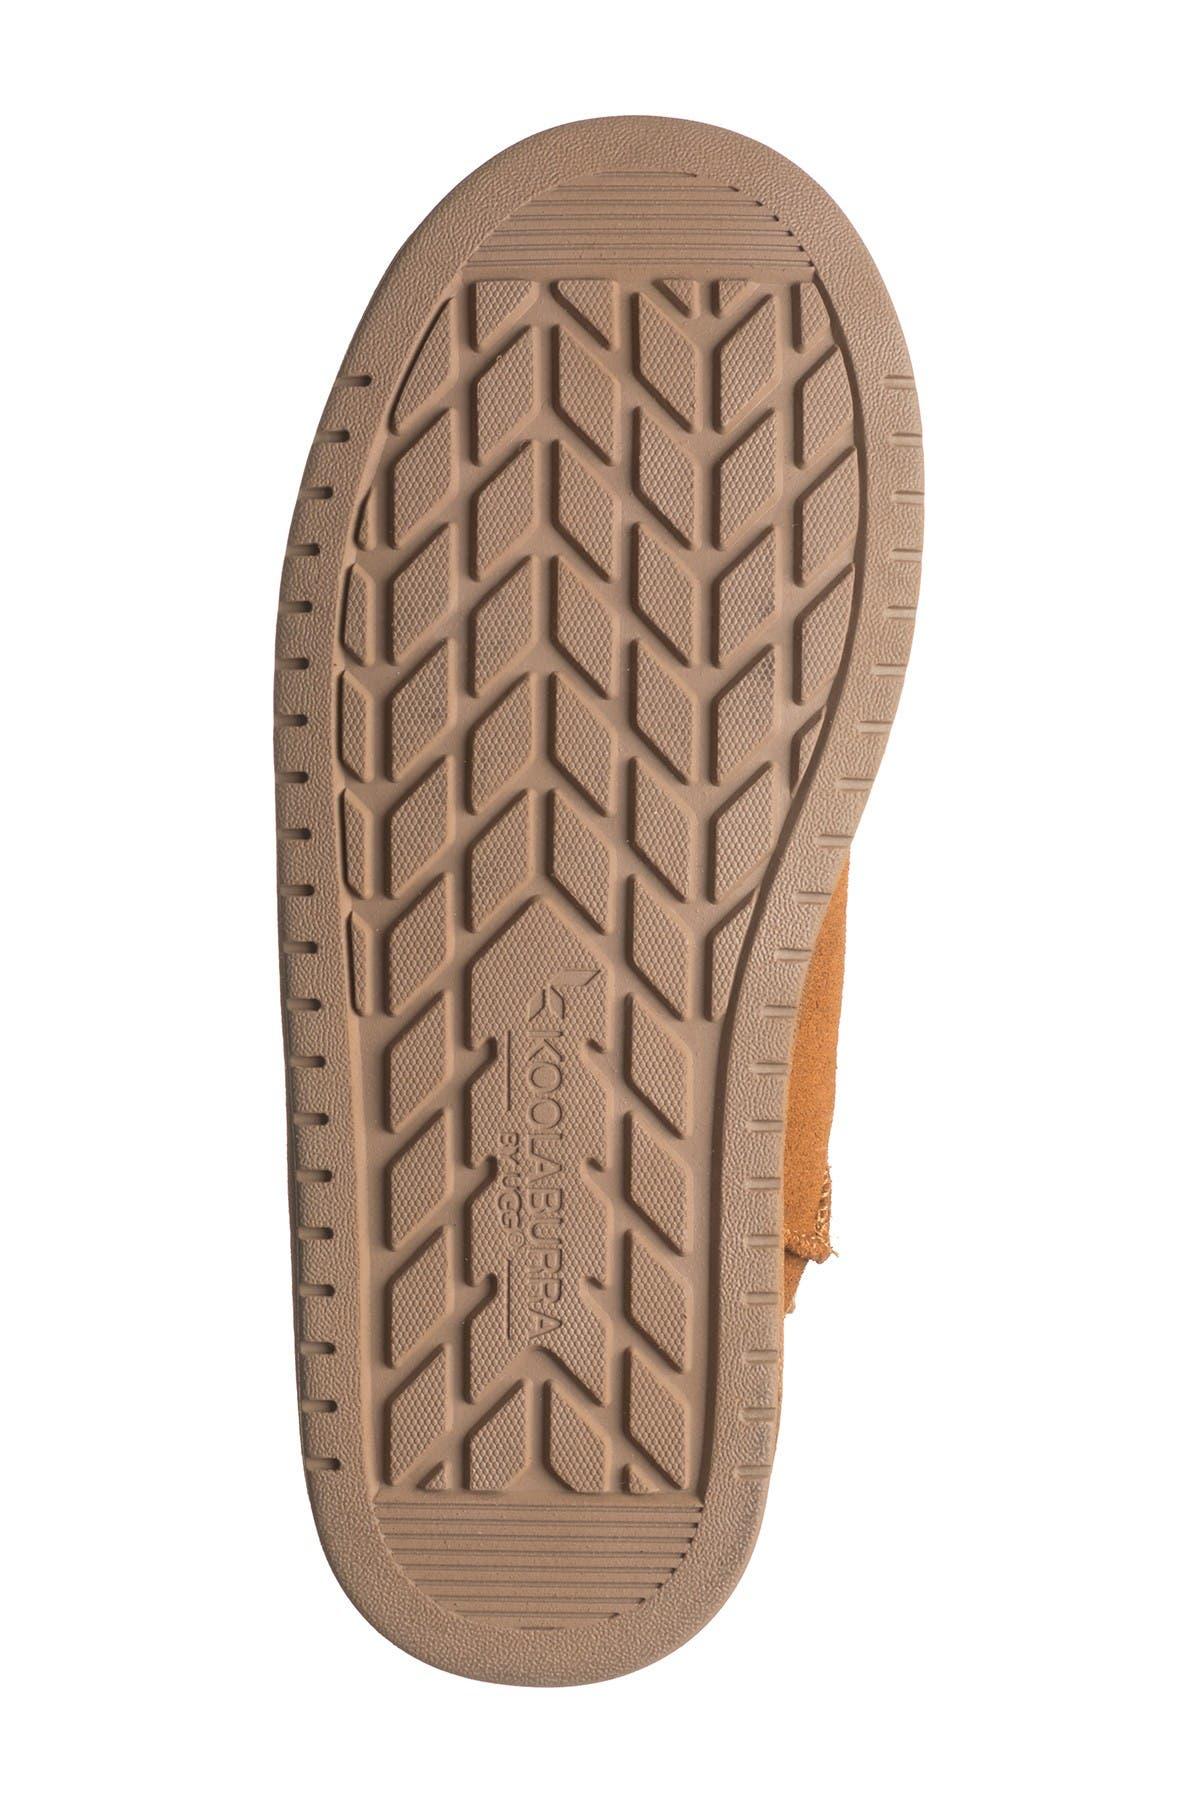 KOOLABURRA BY UGG Koola Faux Fur Lined Suede Tall Boot